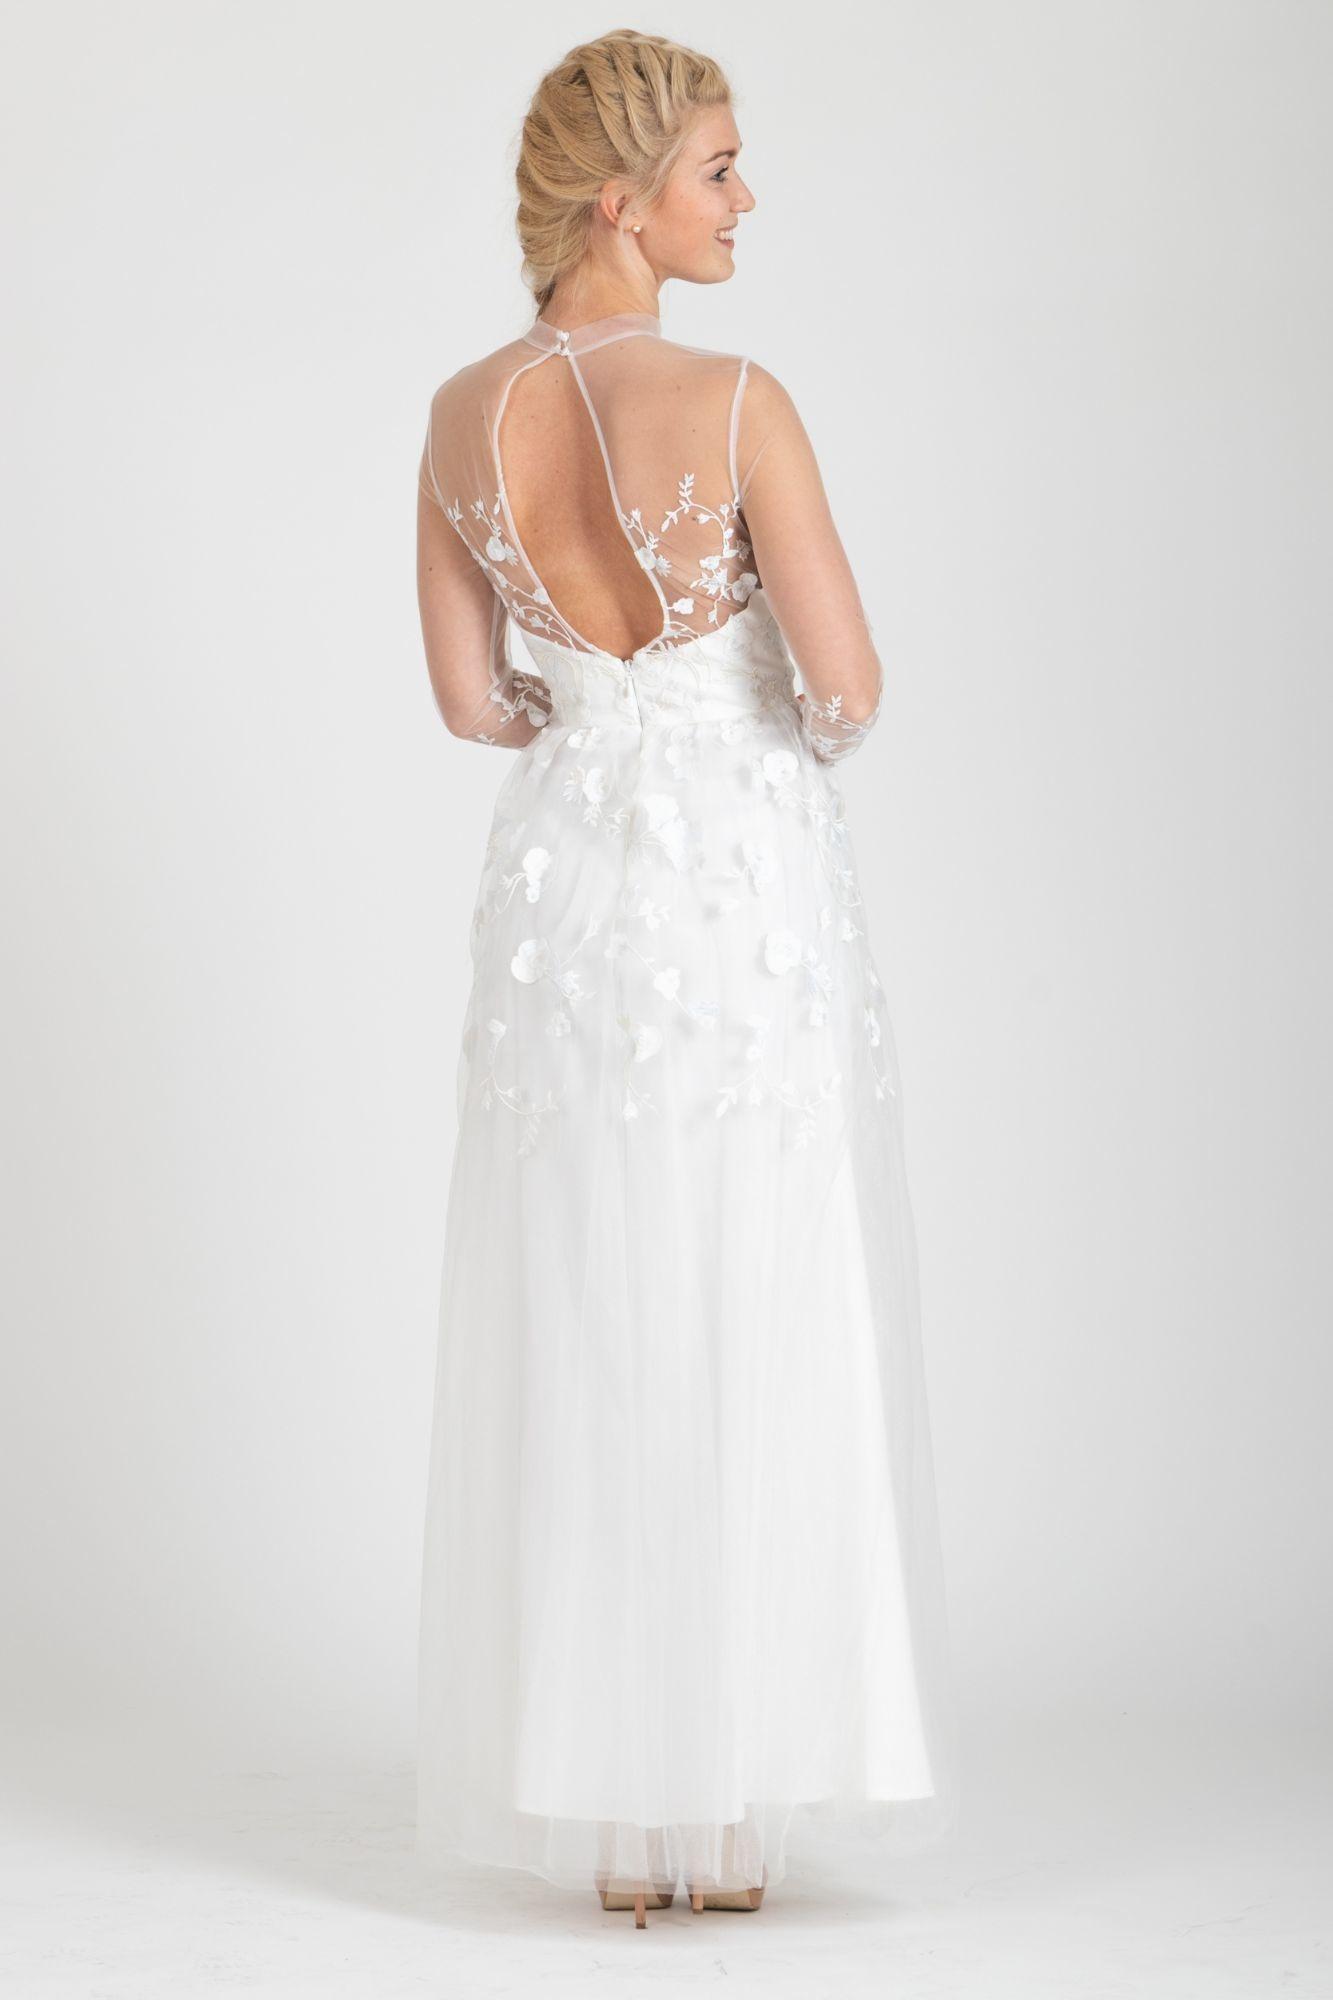 6f106c6f6a7e ... biele Chi Chi London exkluzívne svadobné šaty Annabel